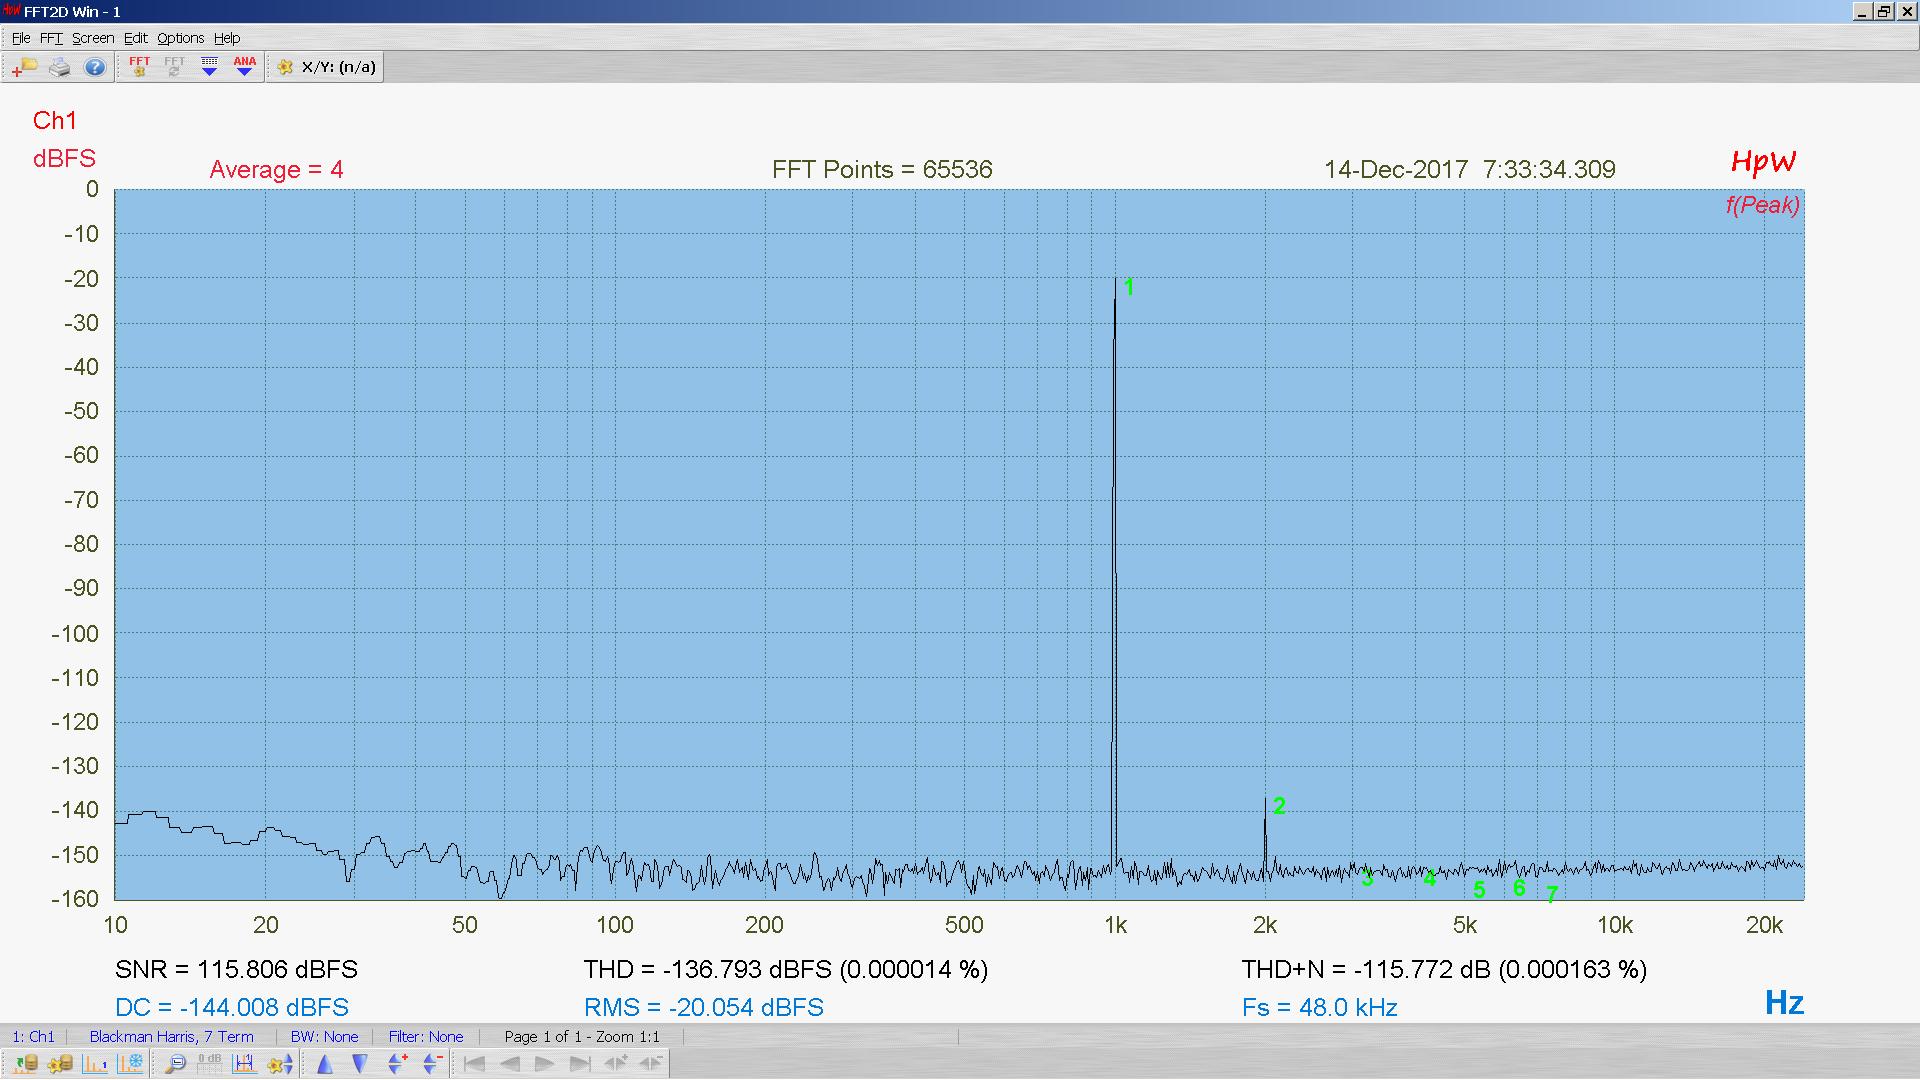 20171214-03 ADI-2 Pro Bal 1KHz THD THD+N spectrum - ASIO -20 dBFS - HpW.PNG